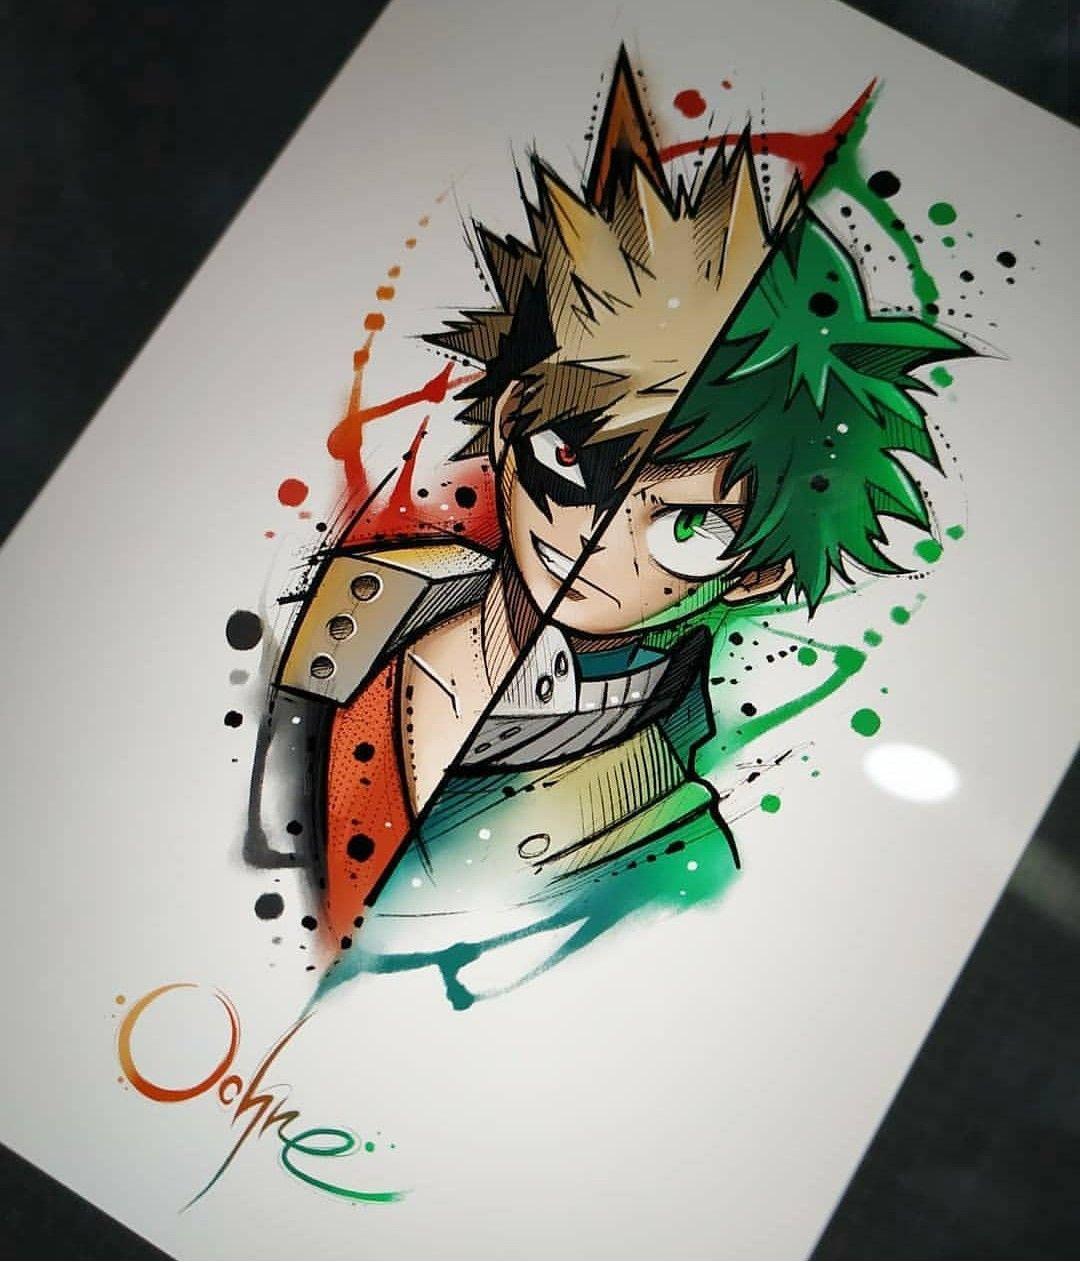 Pin By Gabok On Painting Hero Tattoo Hero Wallpaper Anime Sketch